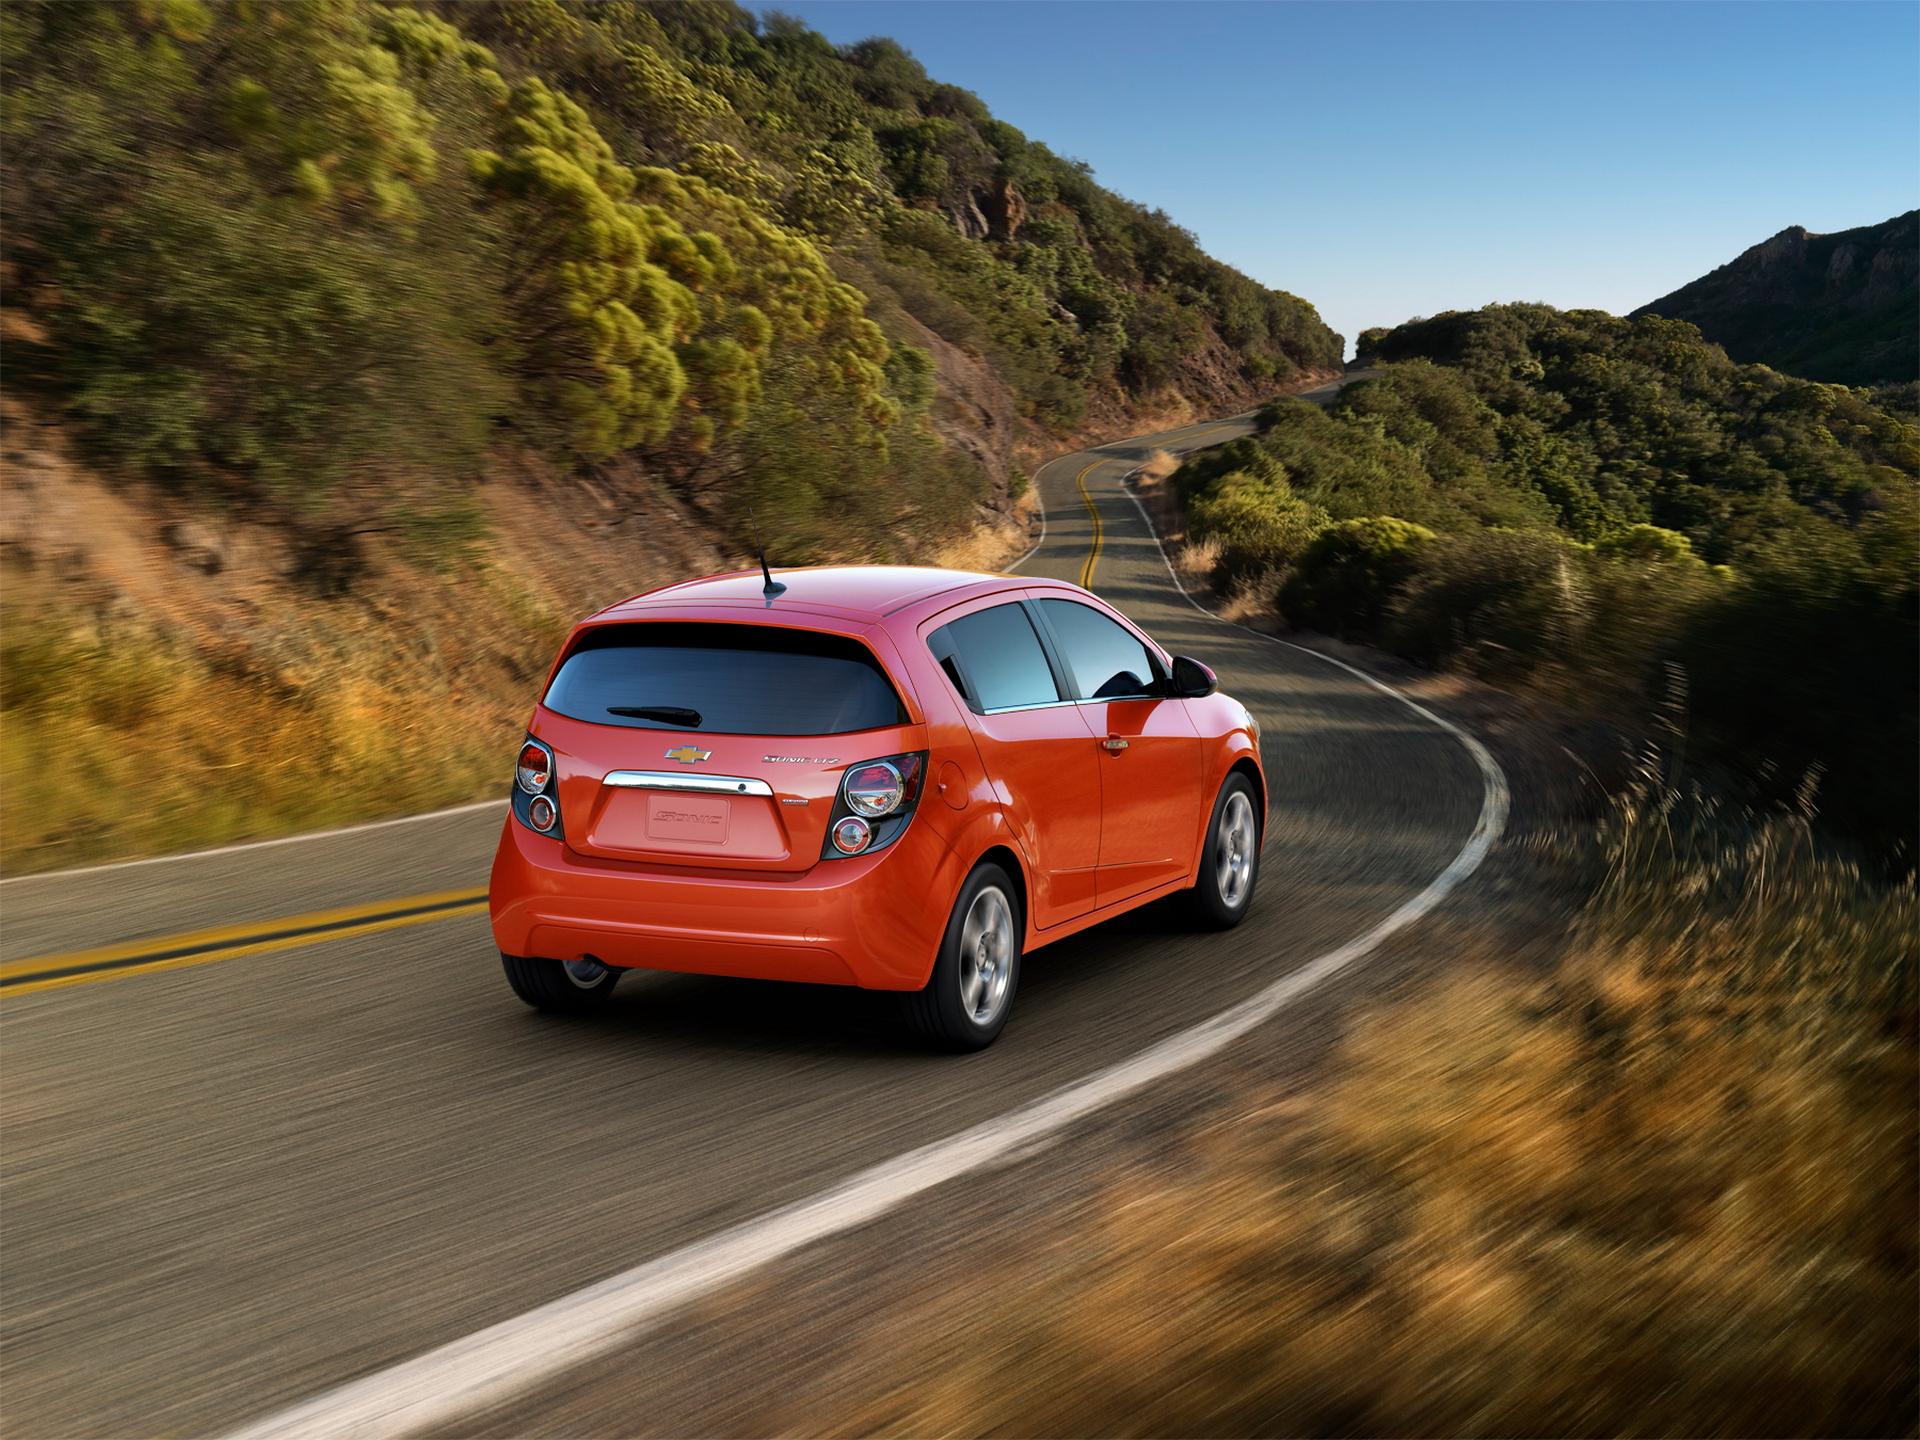 2016 Chevrolet Sonic hatchback © General Motors